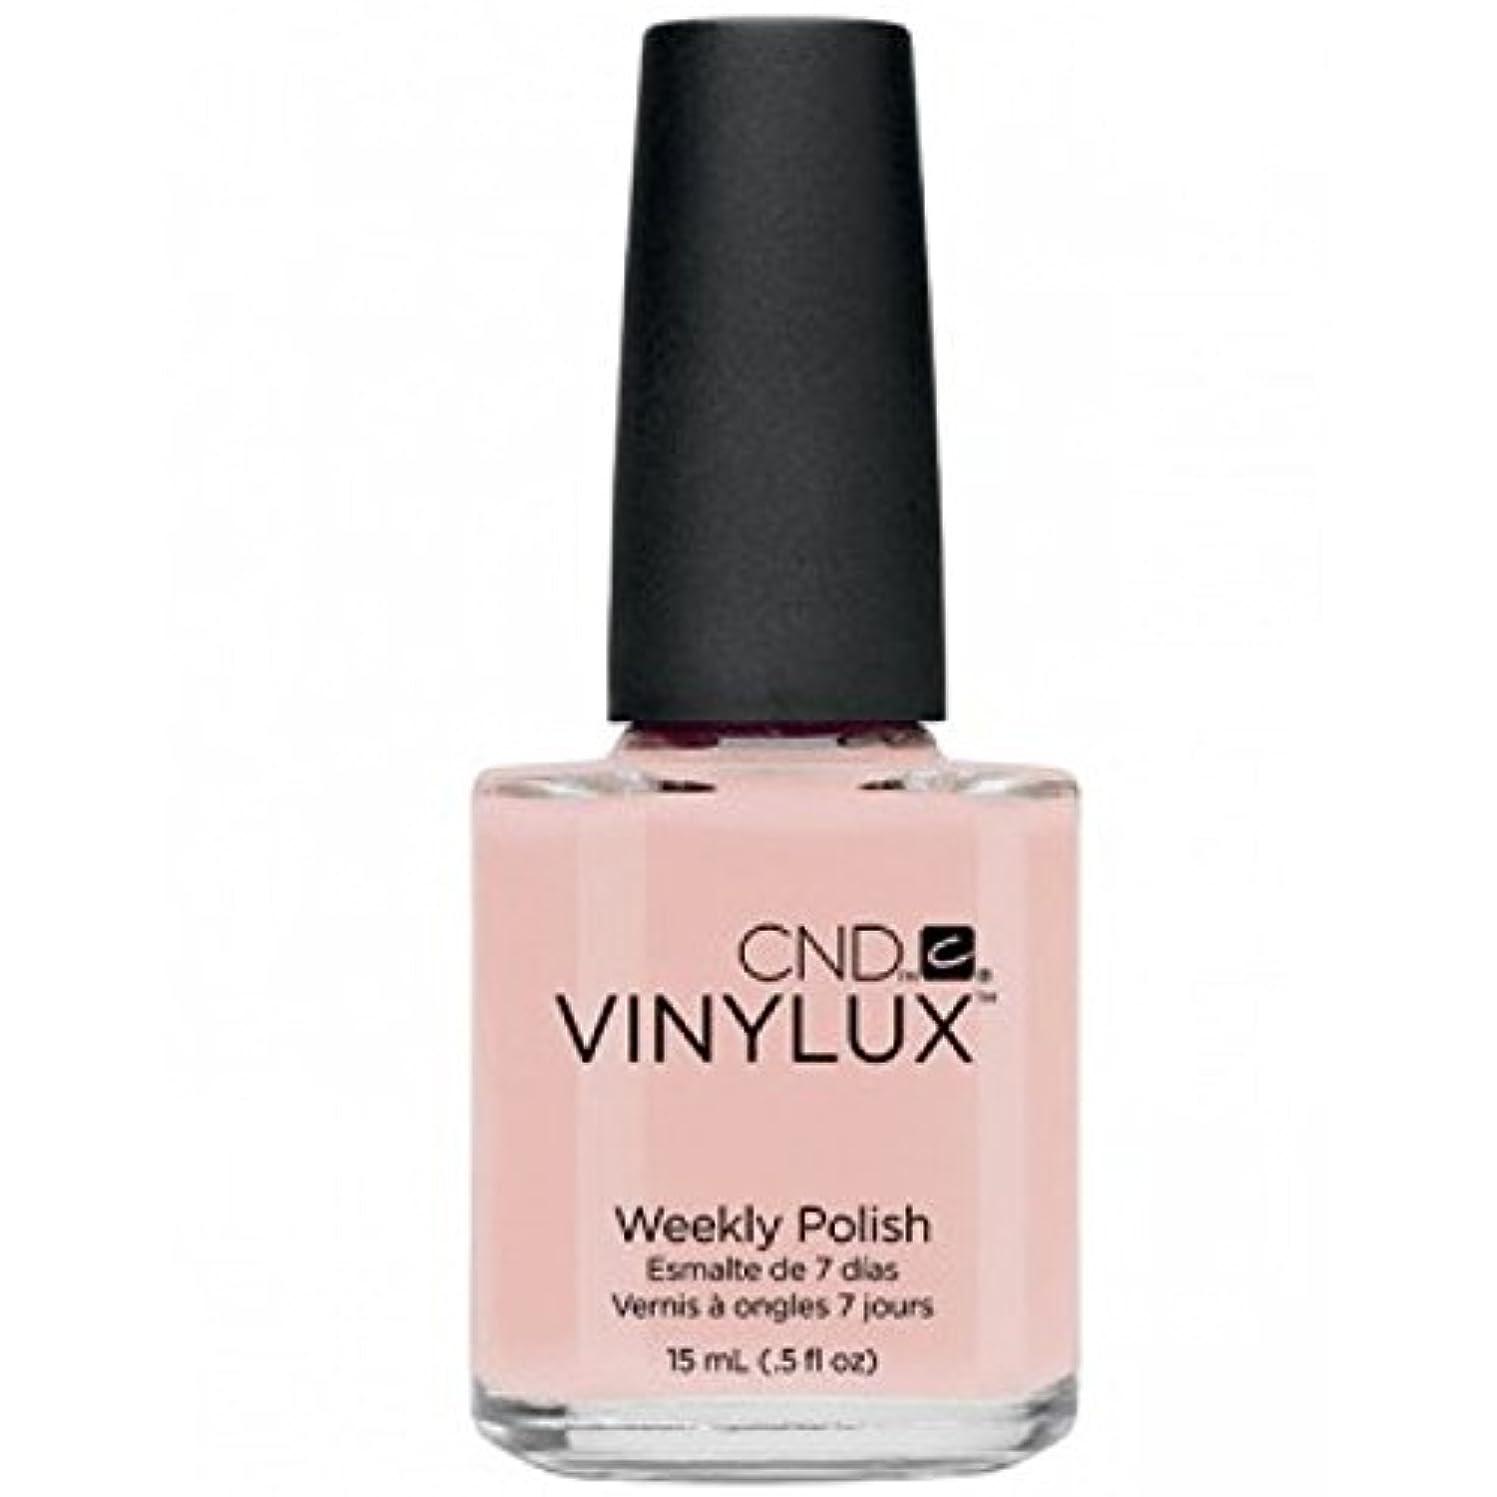 CND Vinylux Manicure Lacquer _ Lavishly Loved #126  _15ml (0.5oz)